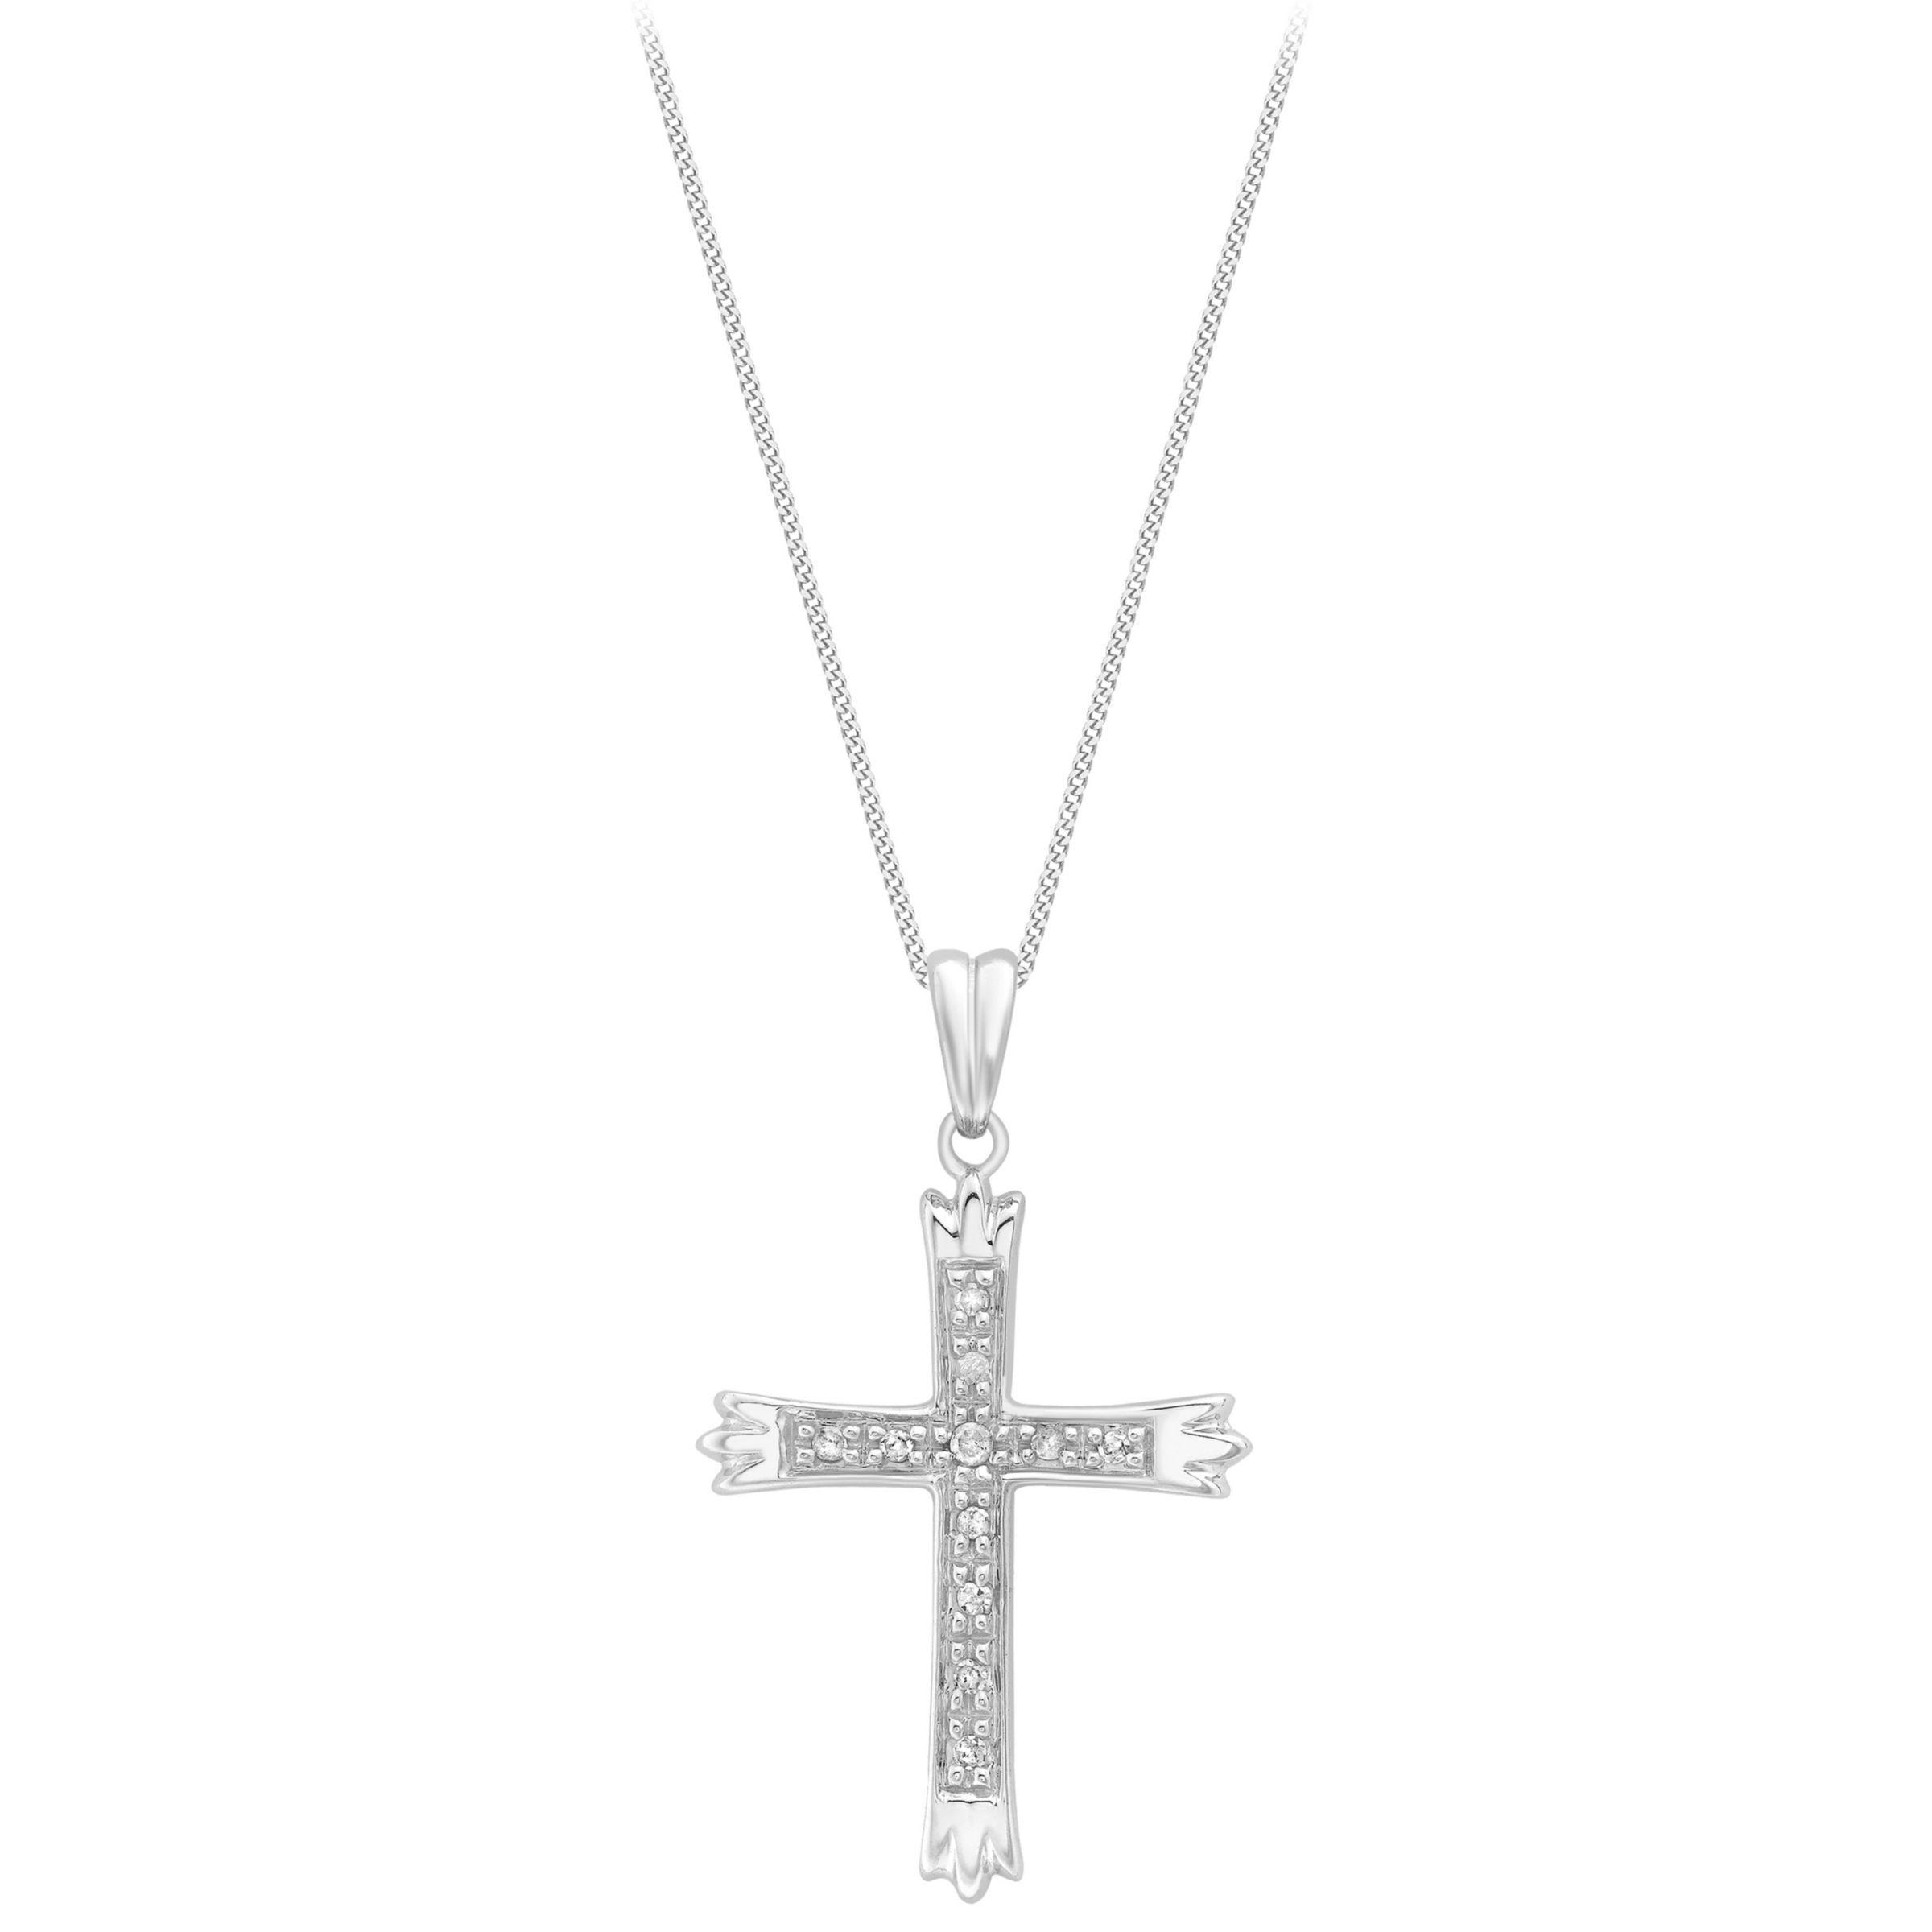 Ib&b 9ct White Gold Cubic Zirconia Cross Pendant in Metallic